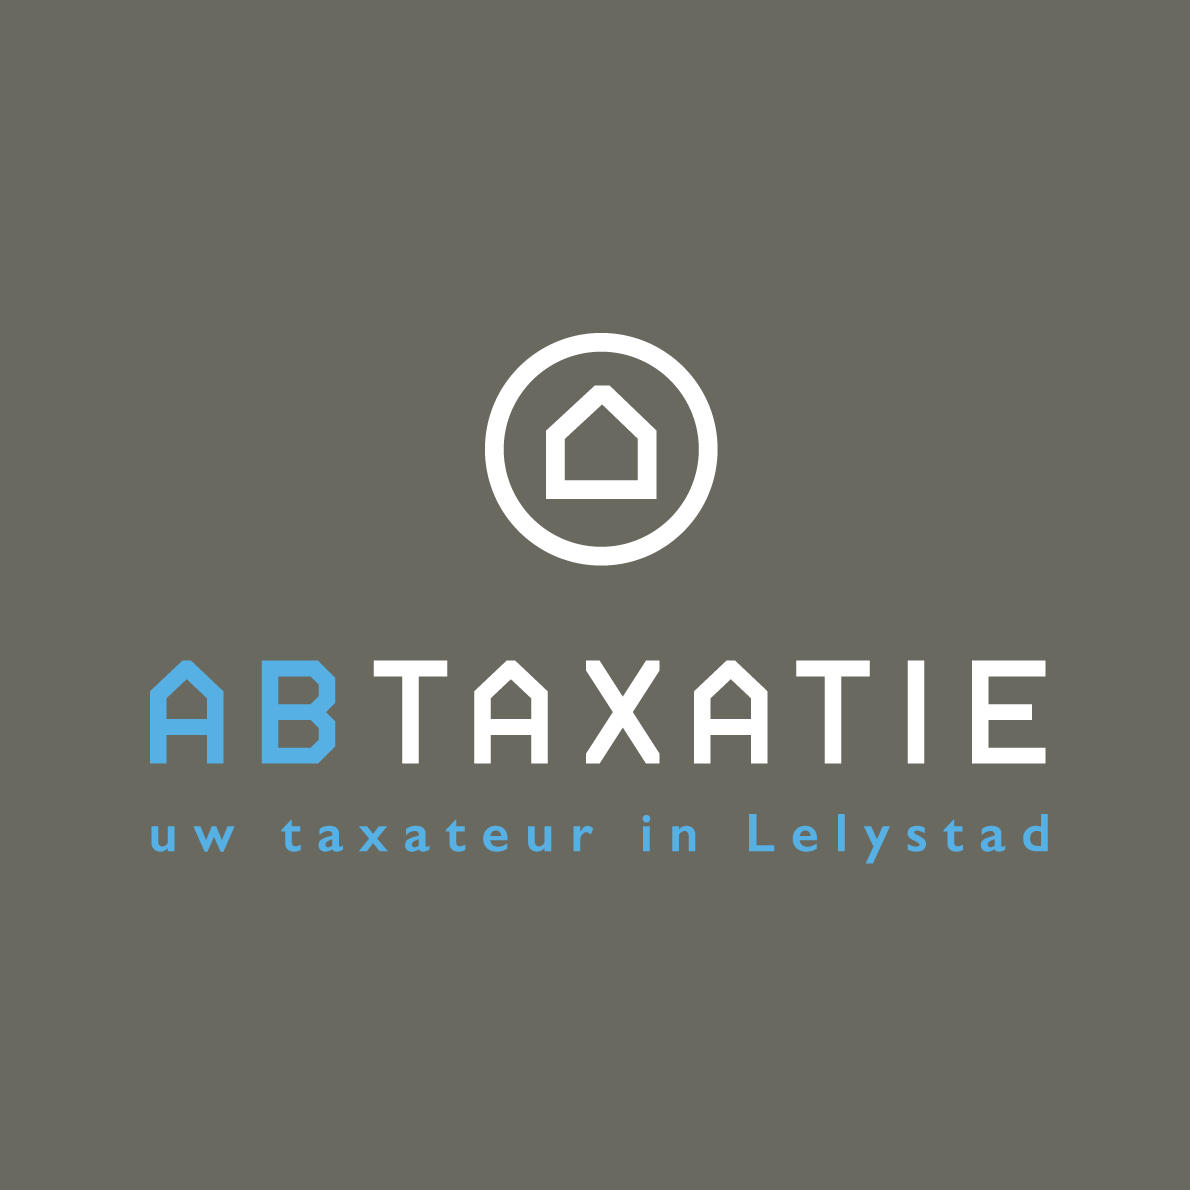 ABTAXATIE Lelystad logo huisstijl visitekaartje visuele identiteit